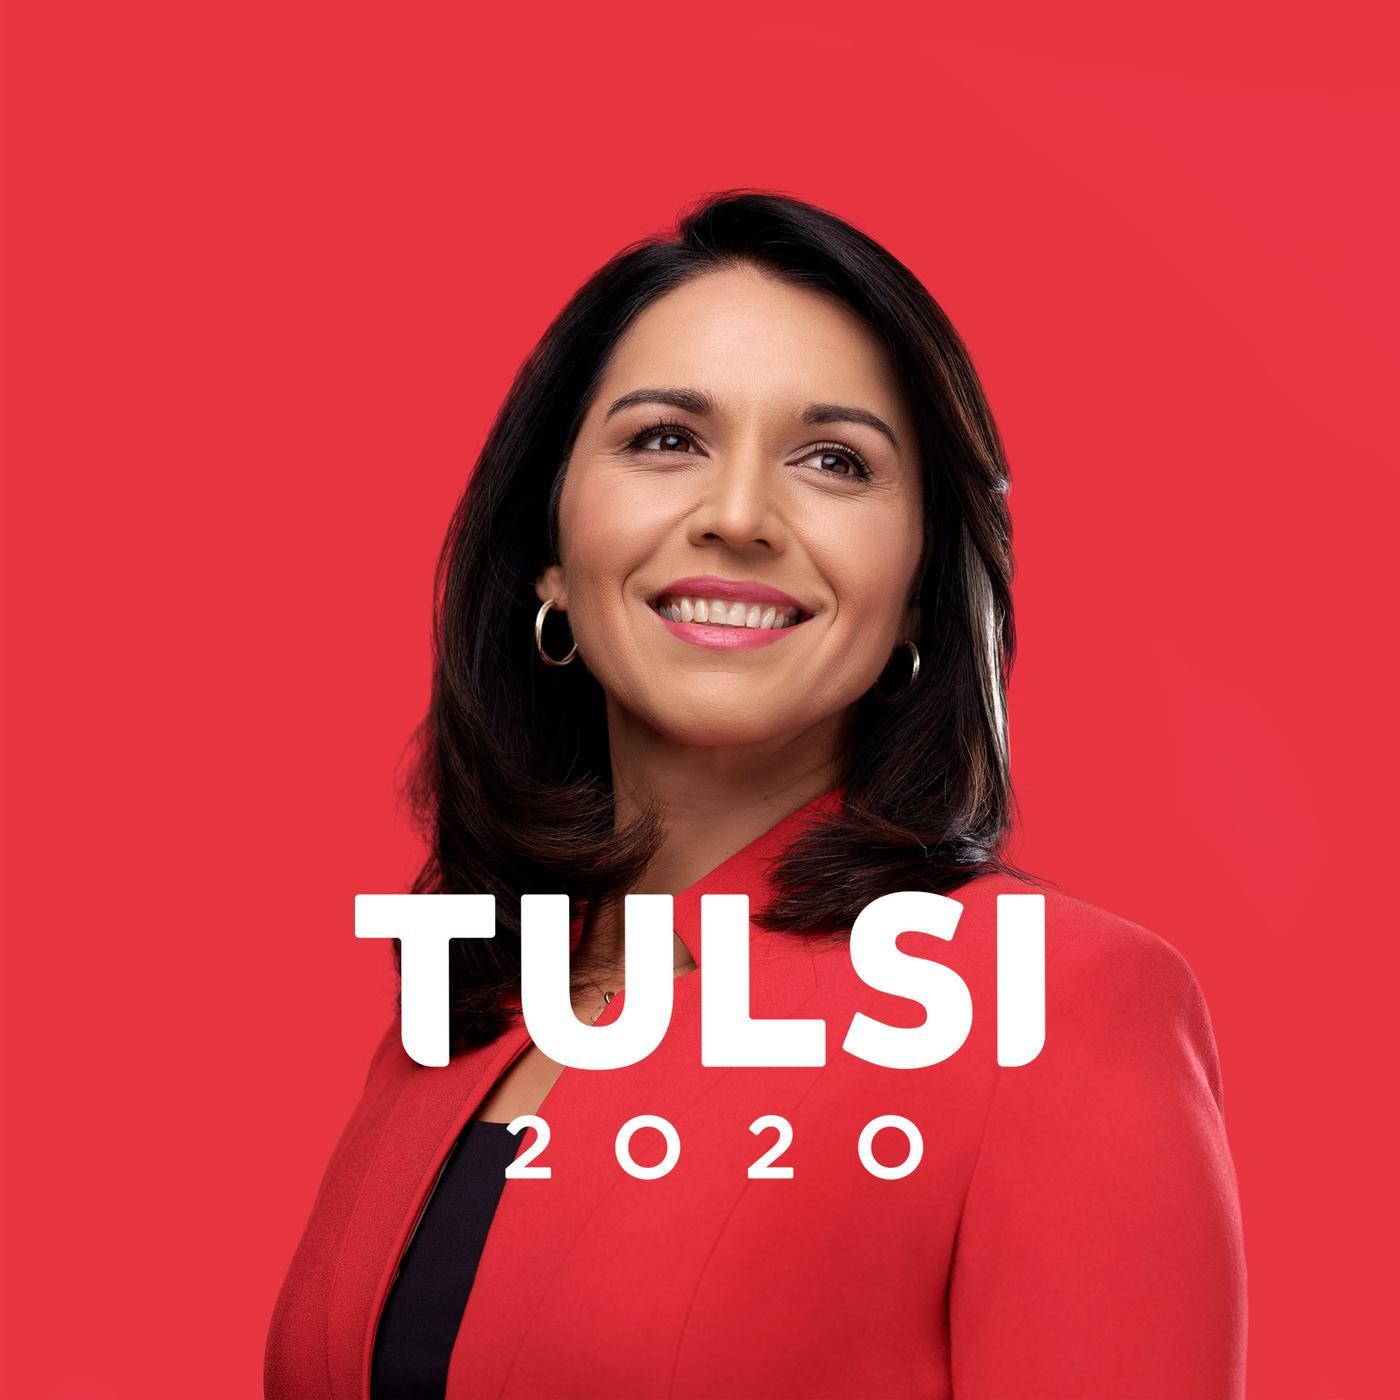 tulsi-now-tulsi-campaign-i_WJTMSxYFz-zd6es9VRpla.1400x1400.jpg